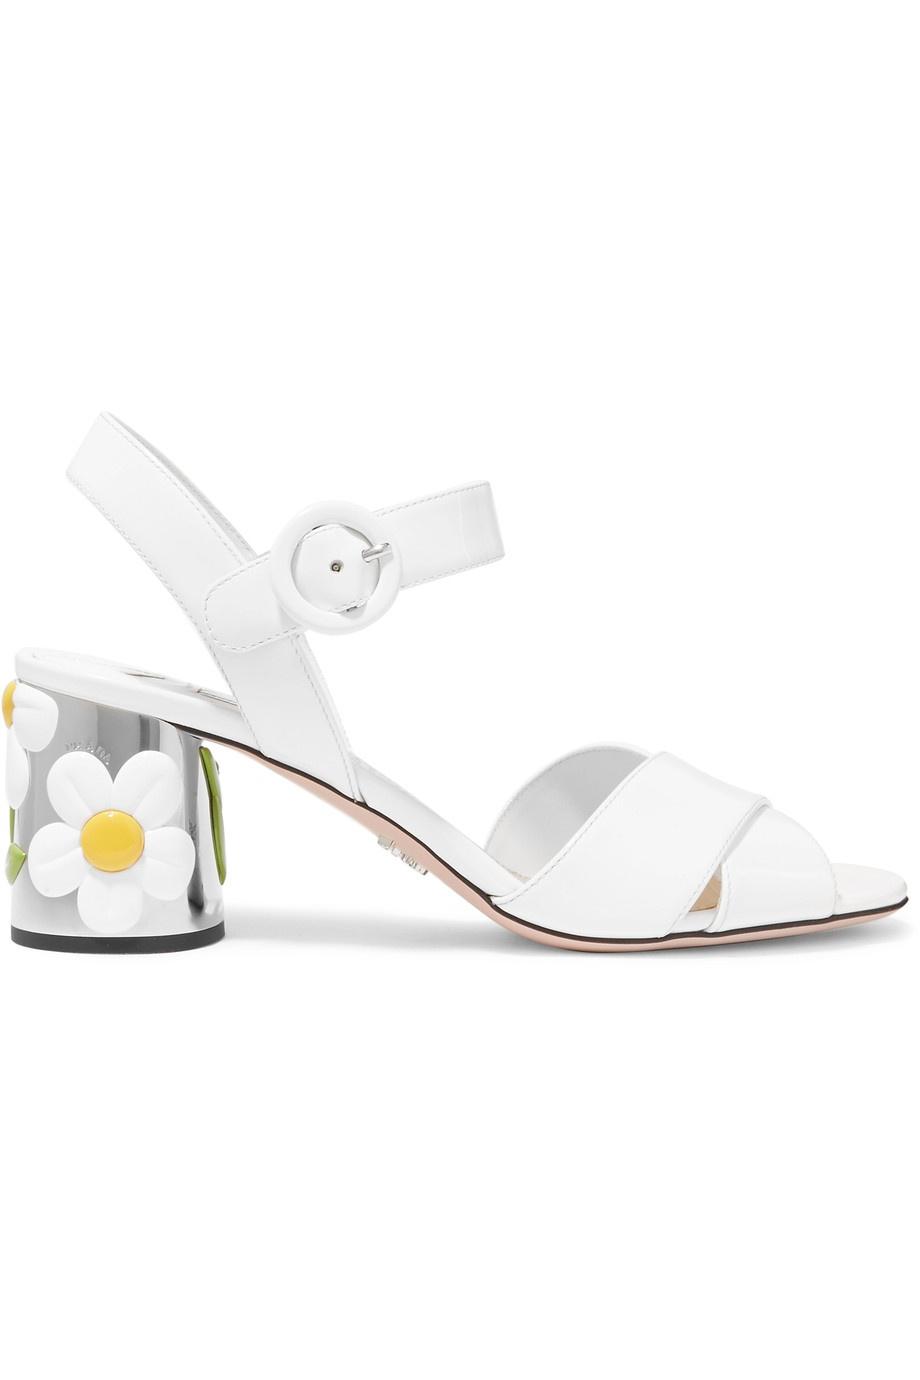 PRADA - Embellished patent-leather sandals